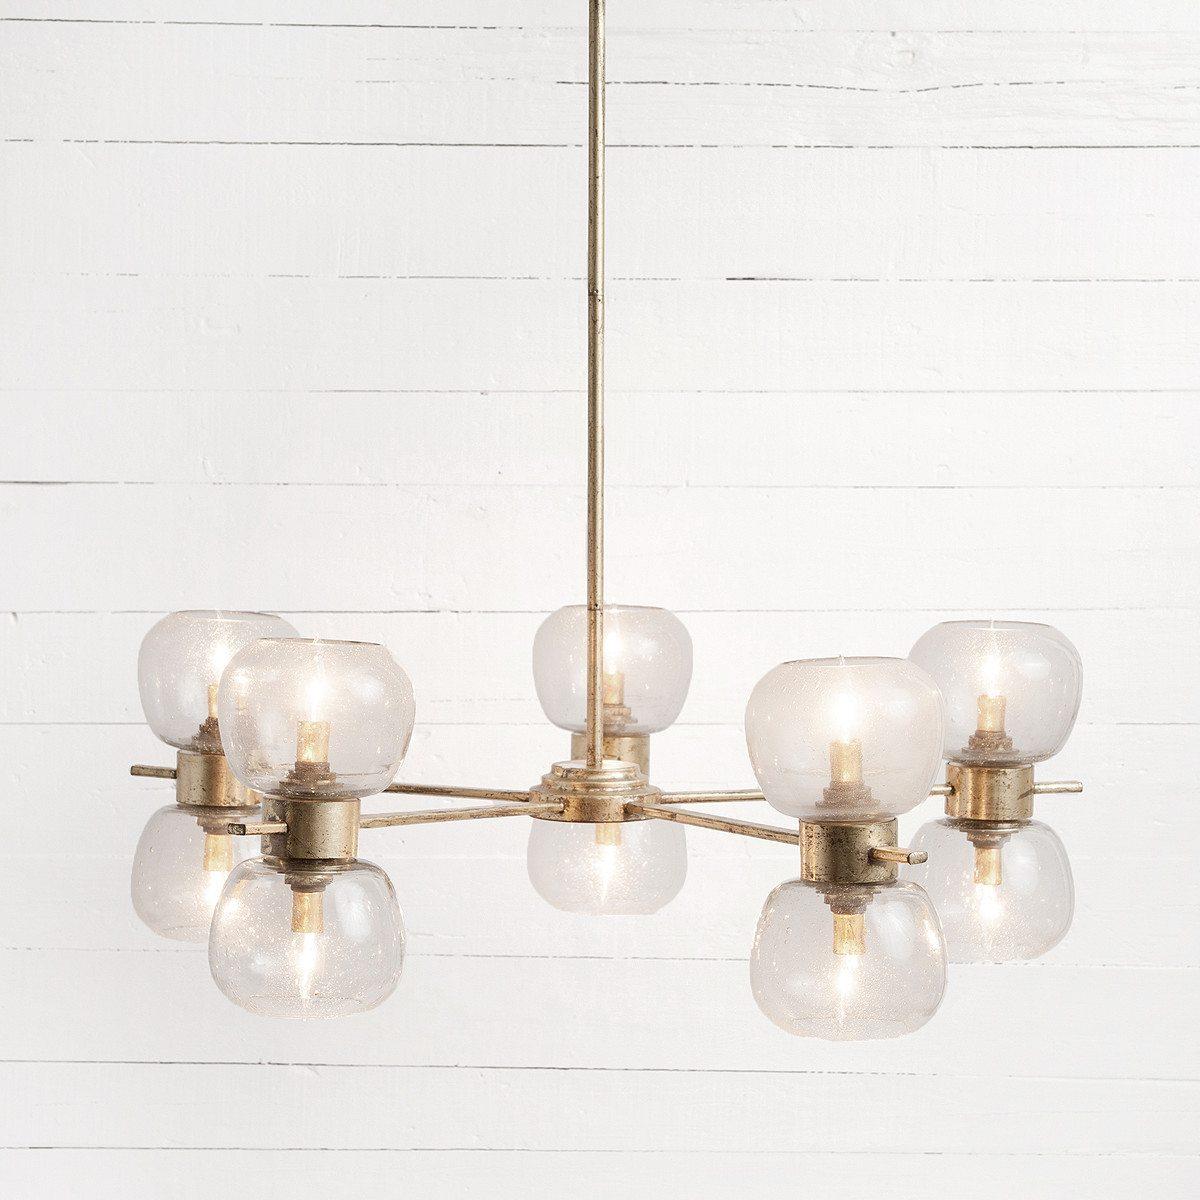 pearson-chandelier-1-shopceladon